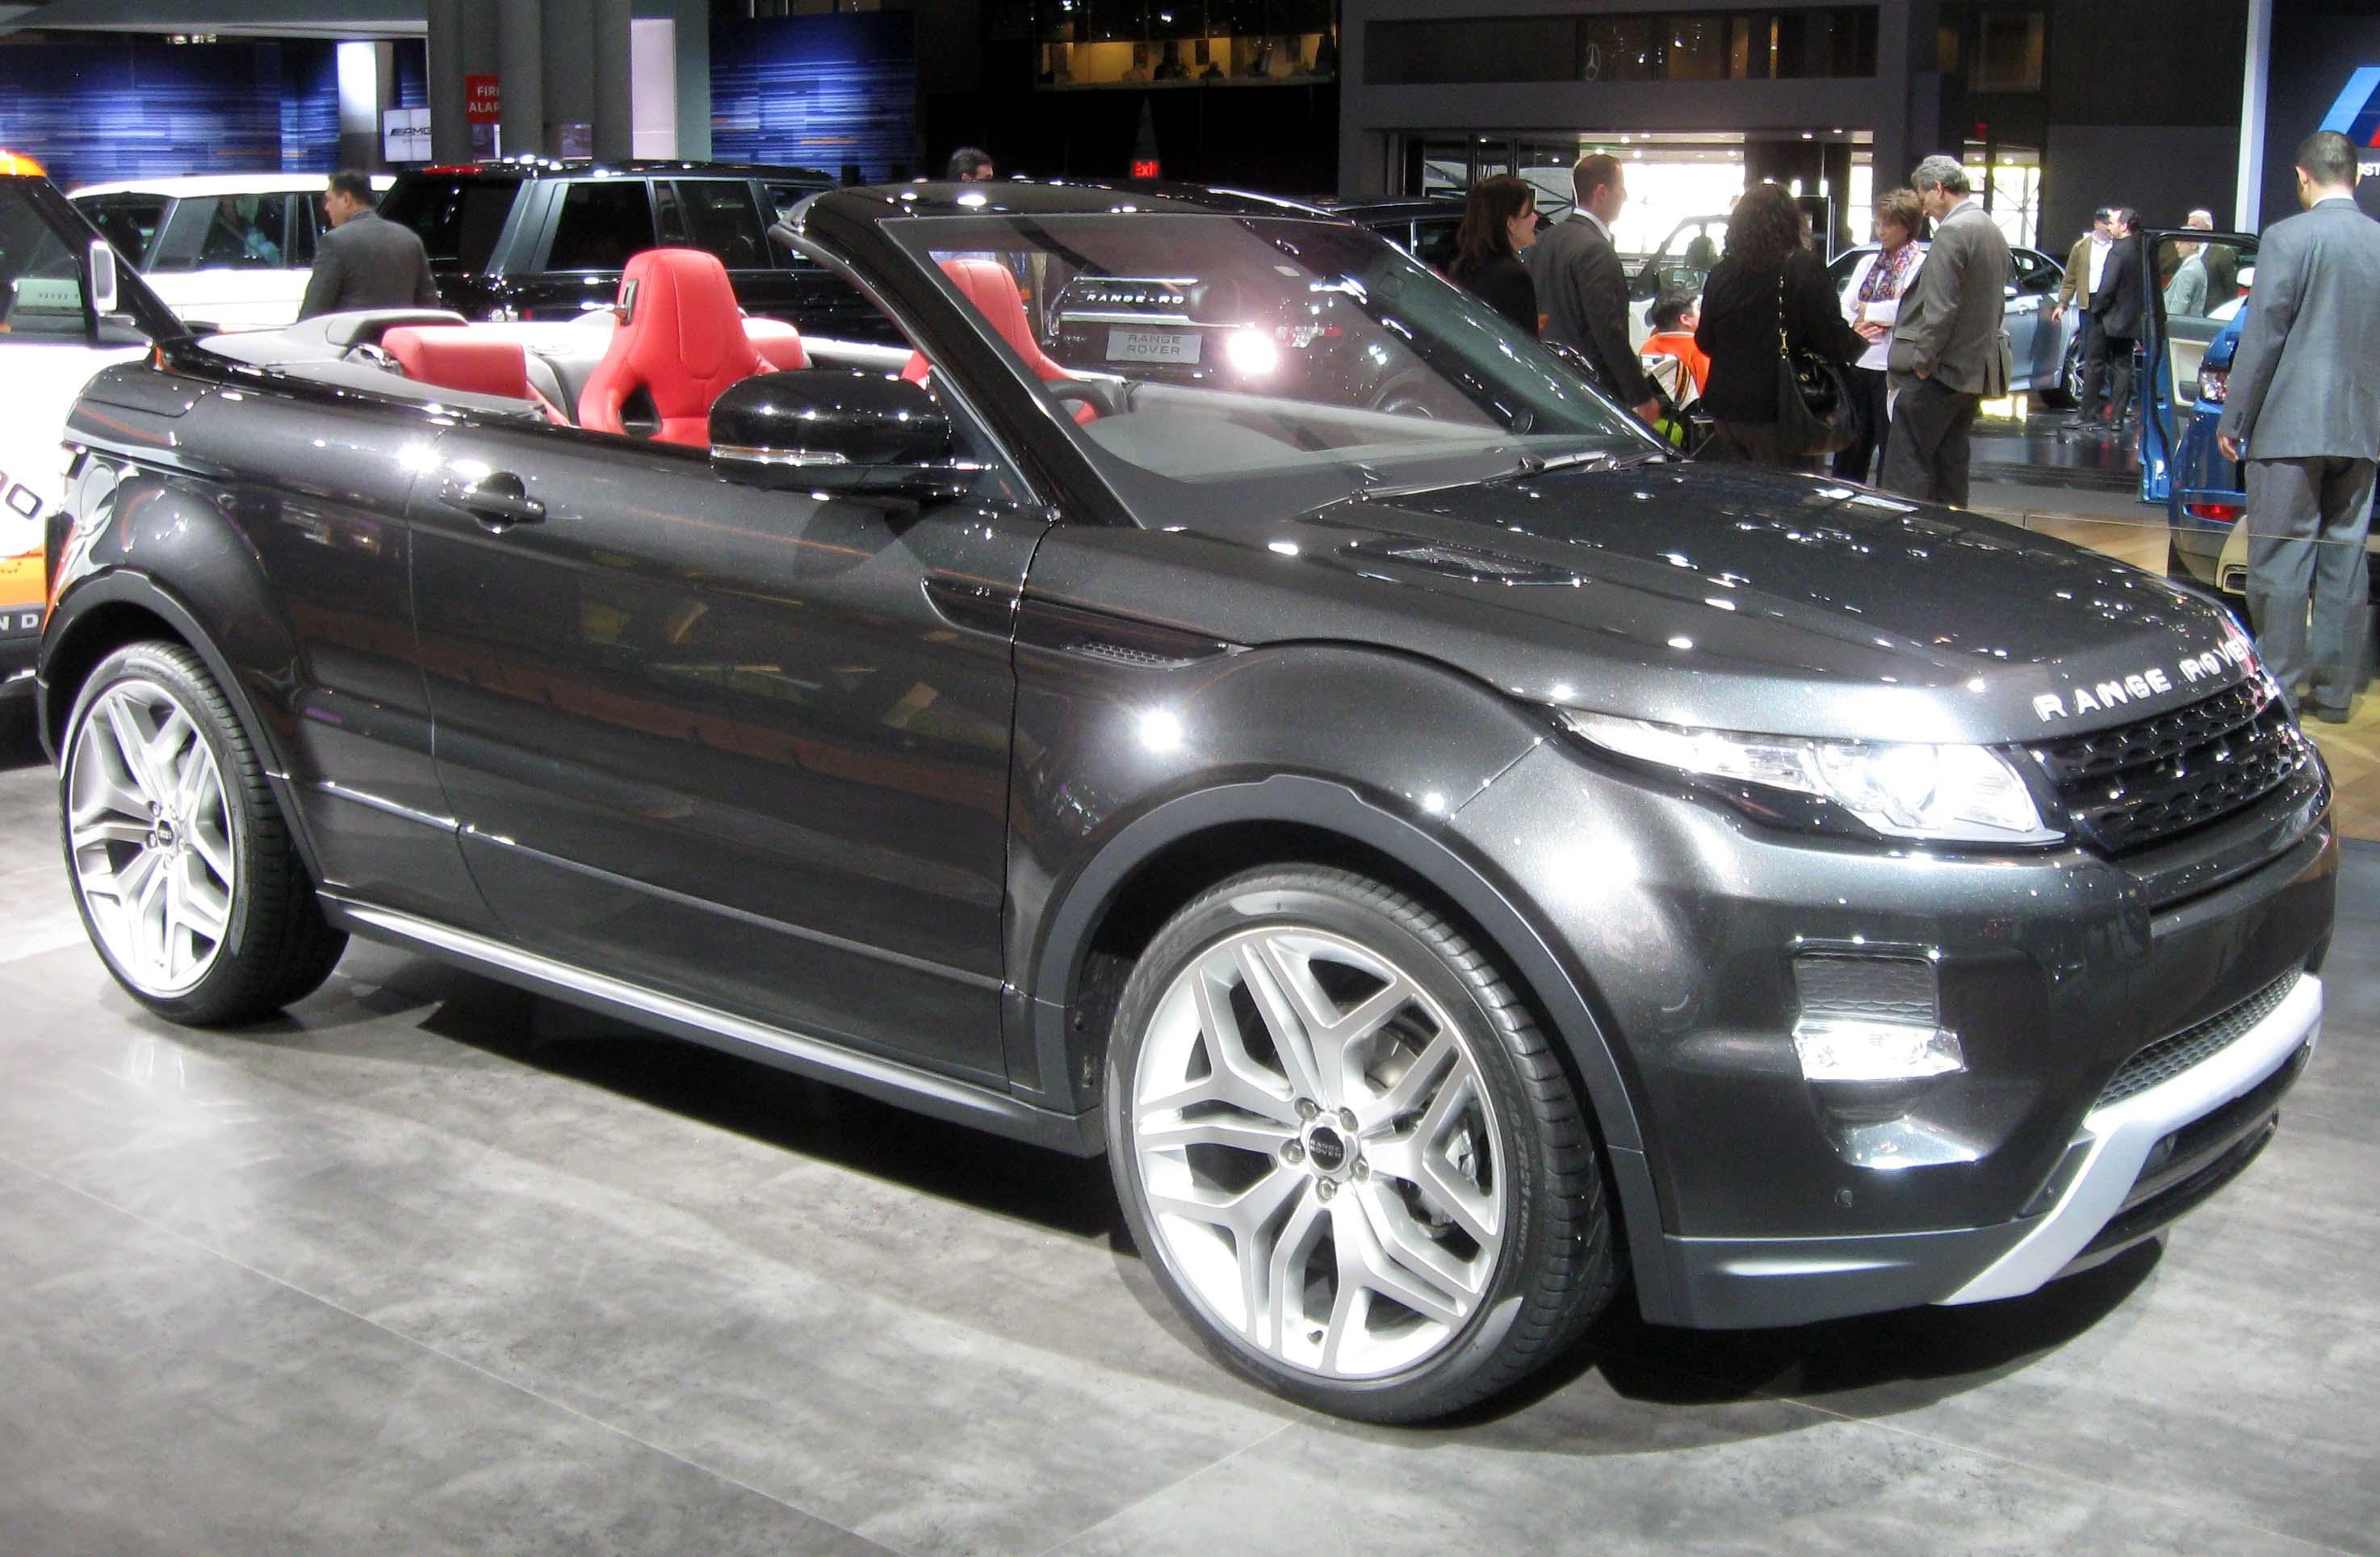 https://upload.wikimedia.org/wikipedia/commons/e/ed/Range_Rover_Evoque_convertible_--_2012_NYIAS.JPG